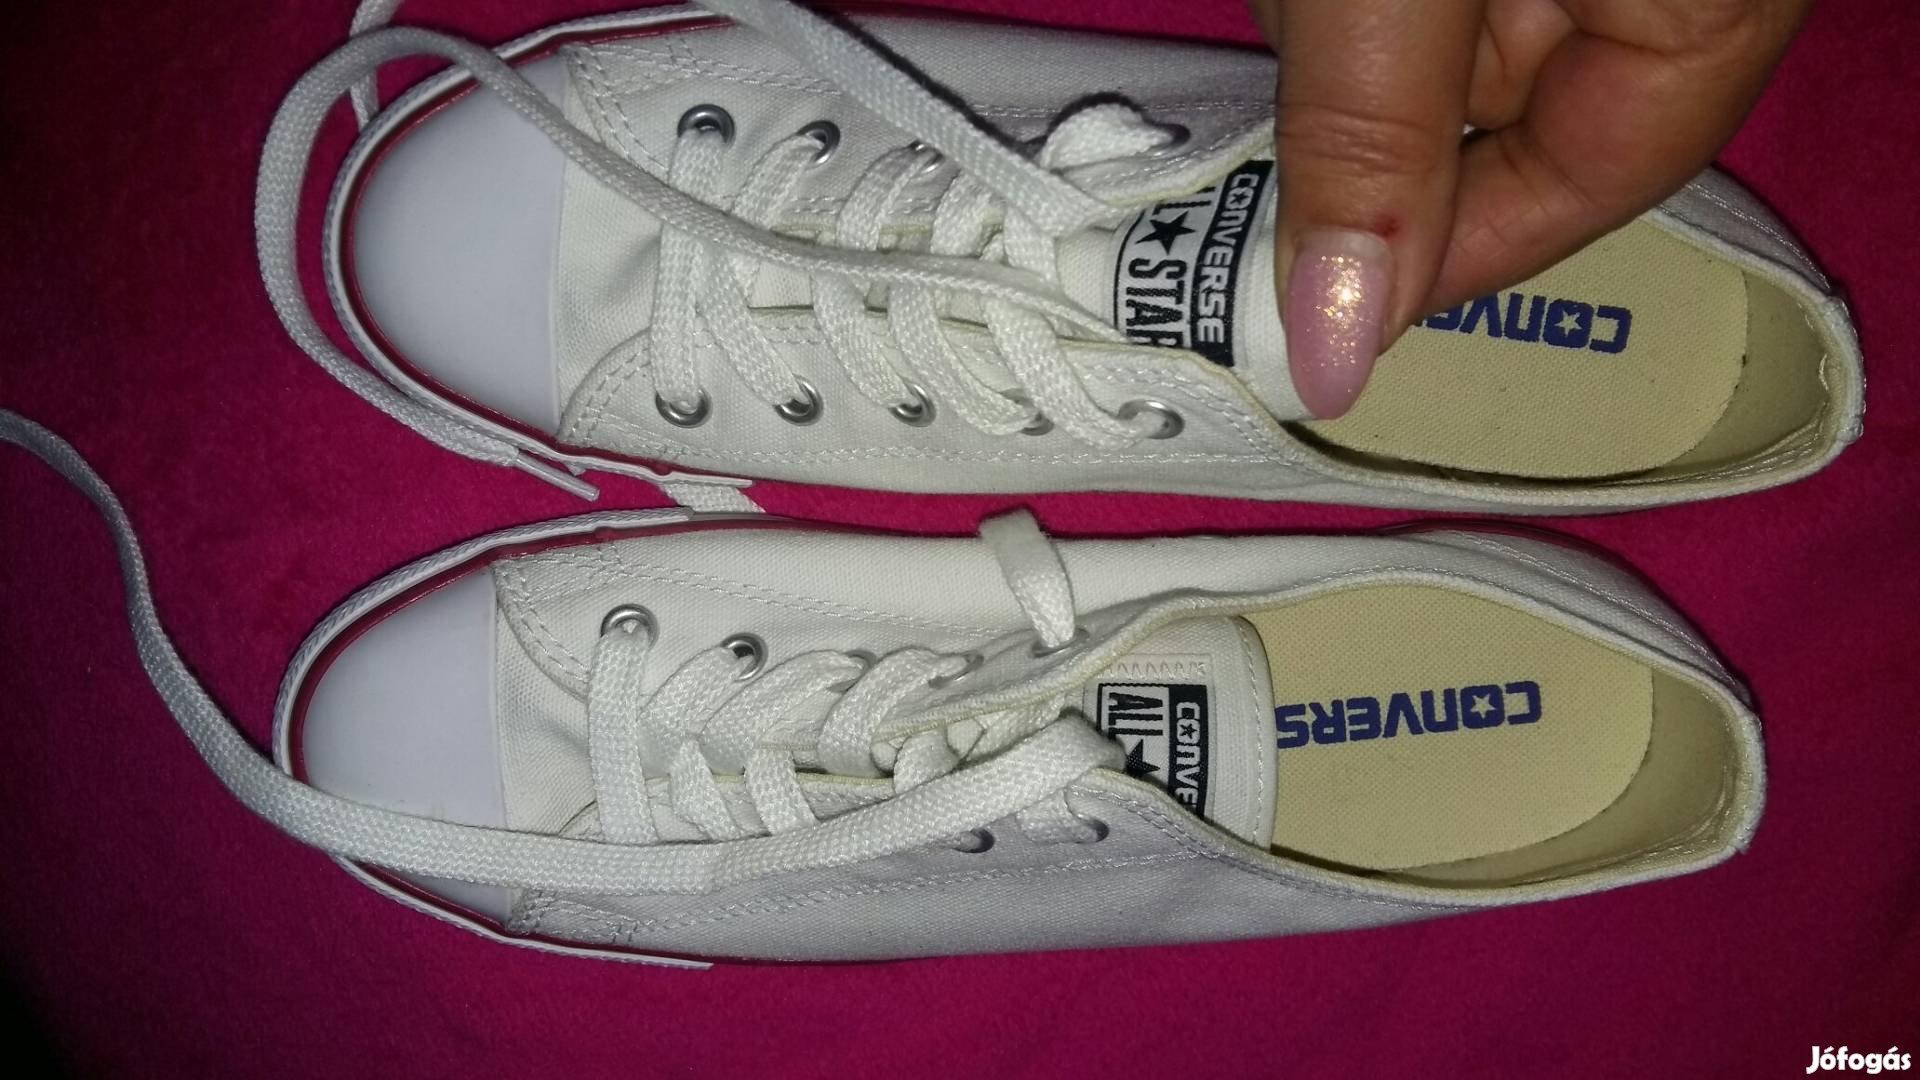 Eredeti converse cipő eladó 38as bth 24cm. - Debrecen 41c82591bb